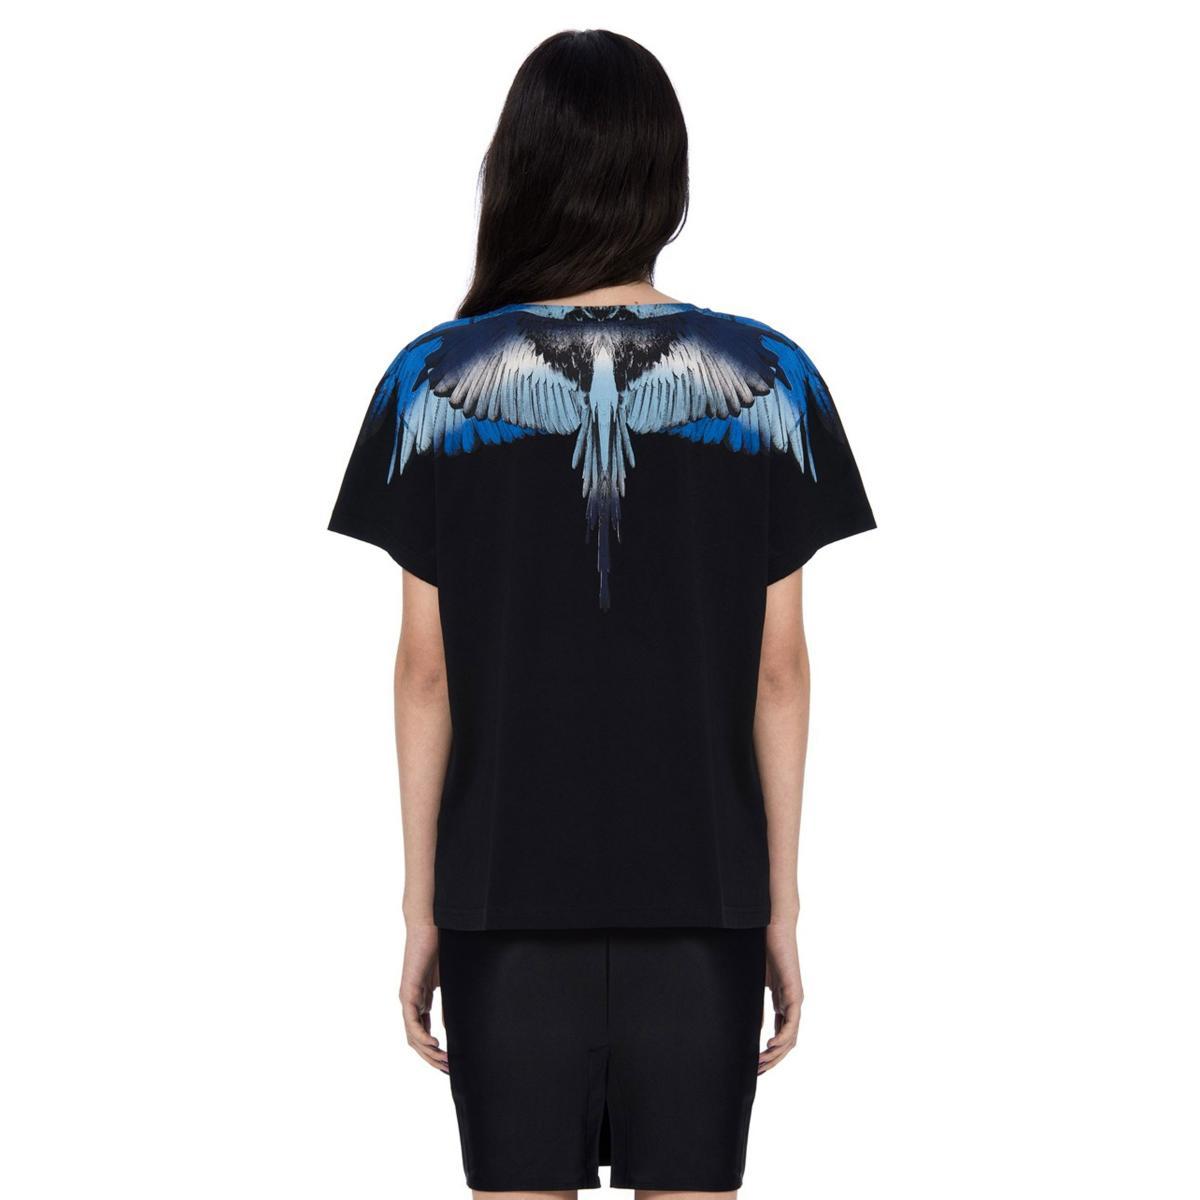 T-shirt Marcelo Burlon Blue Wings da donna rif. BLUE WINGS